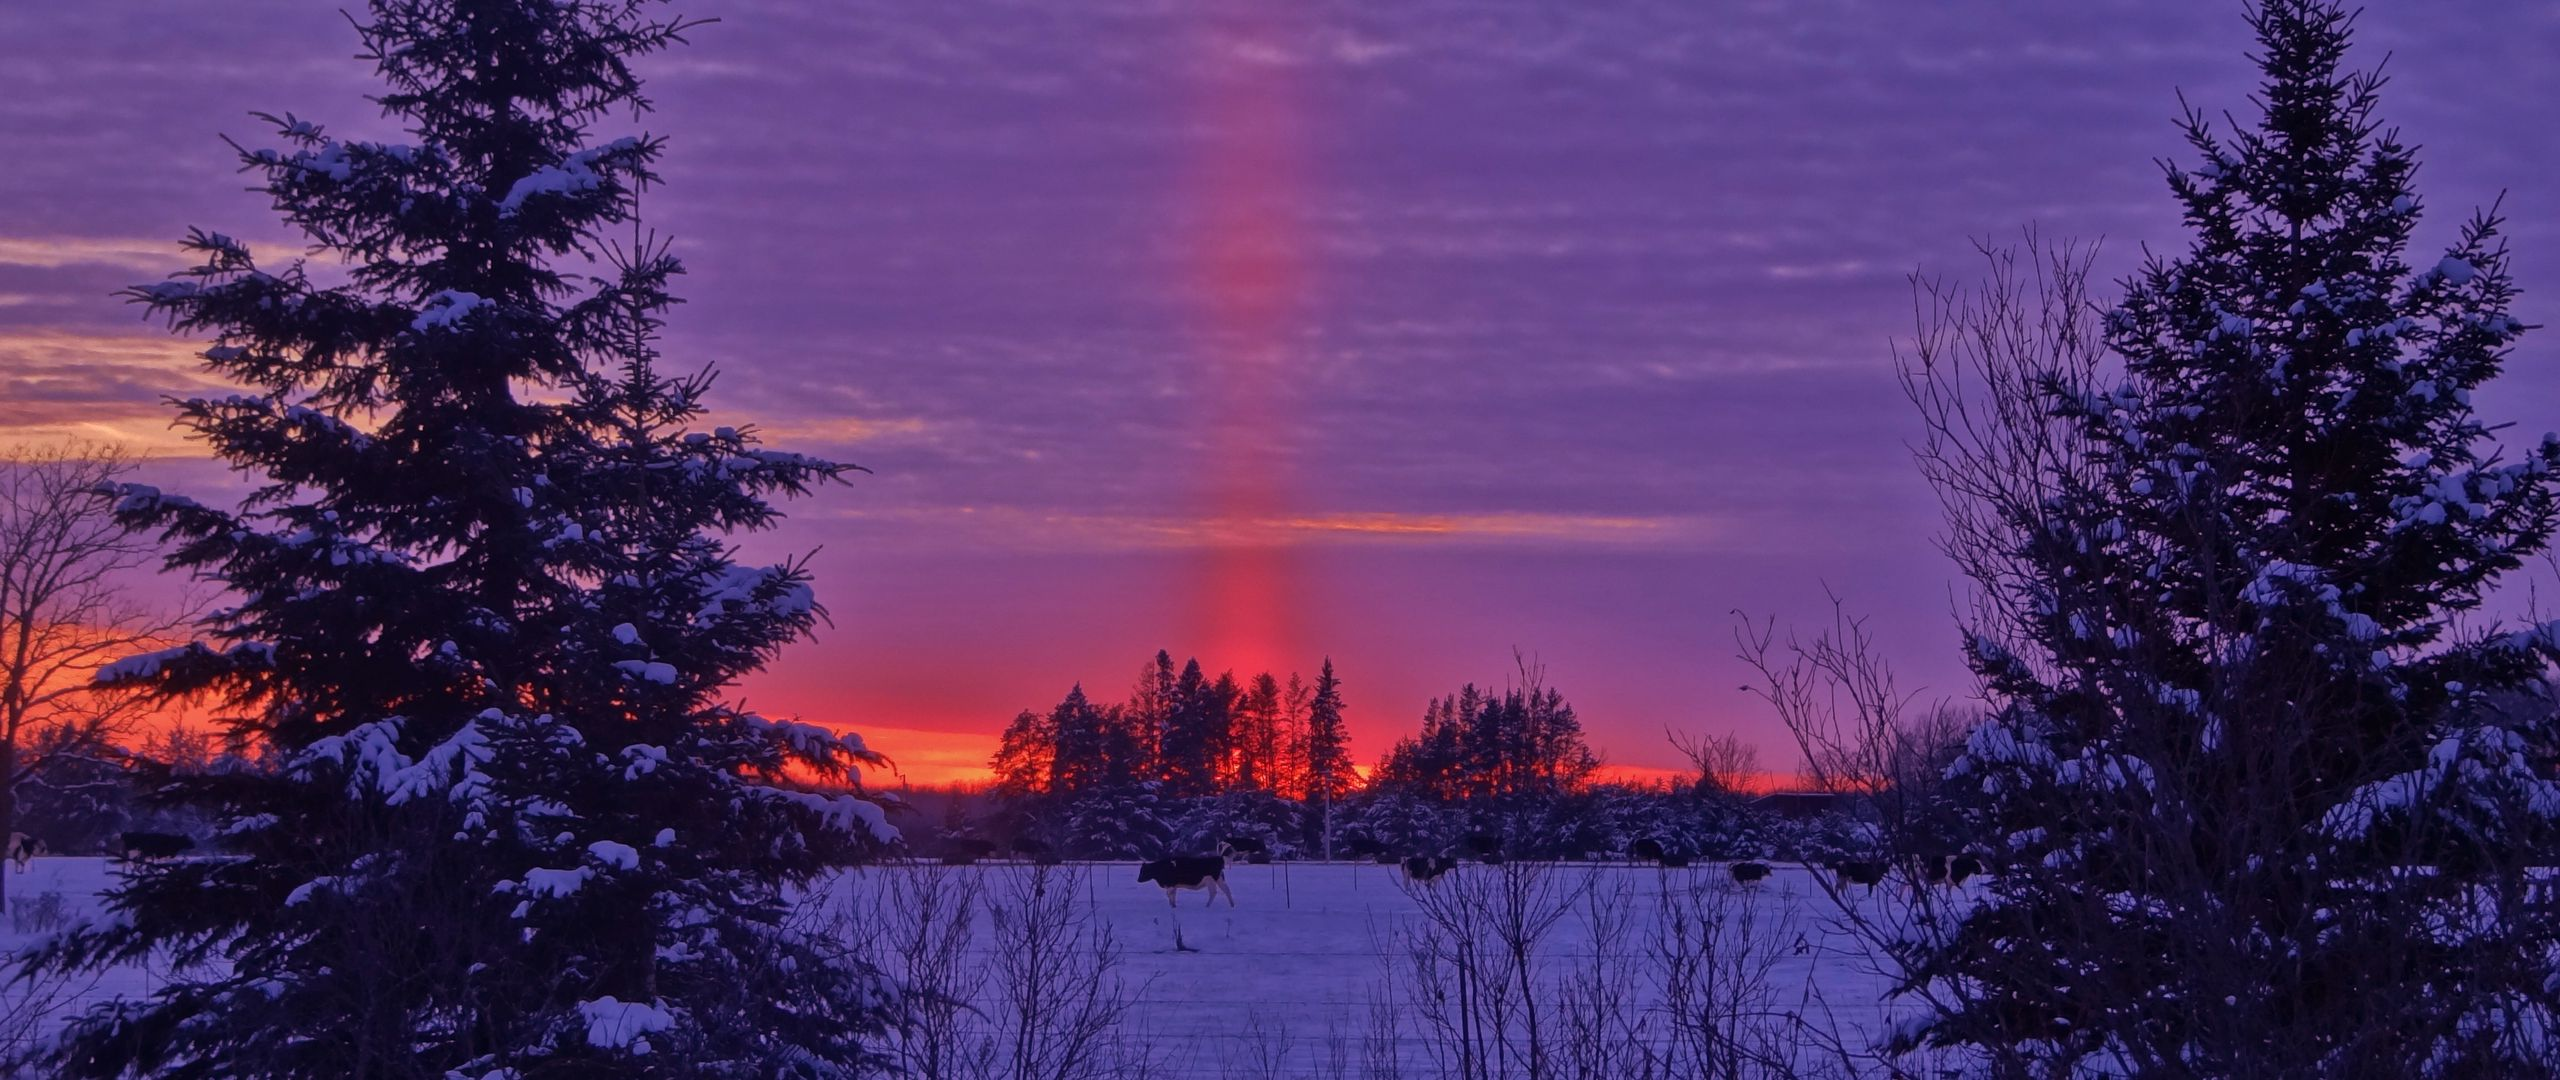 2560x1080 Wallpaper winter, sunset, field, landscape